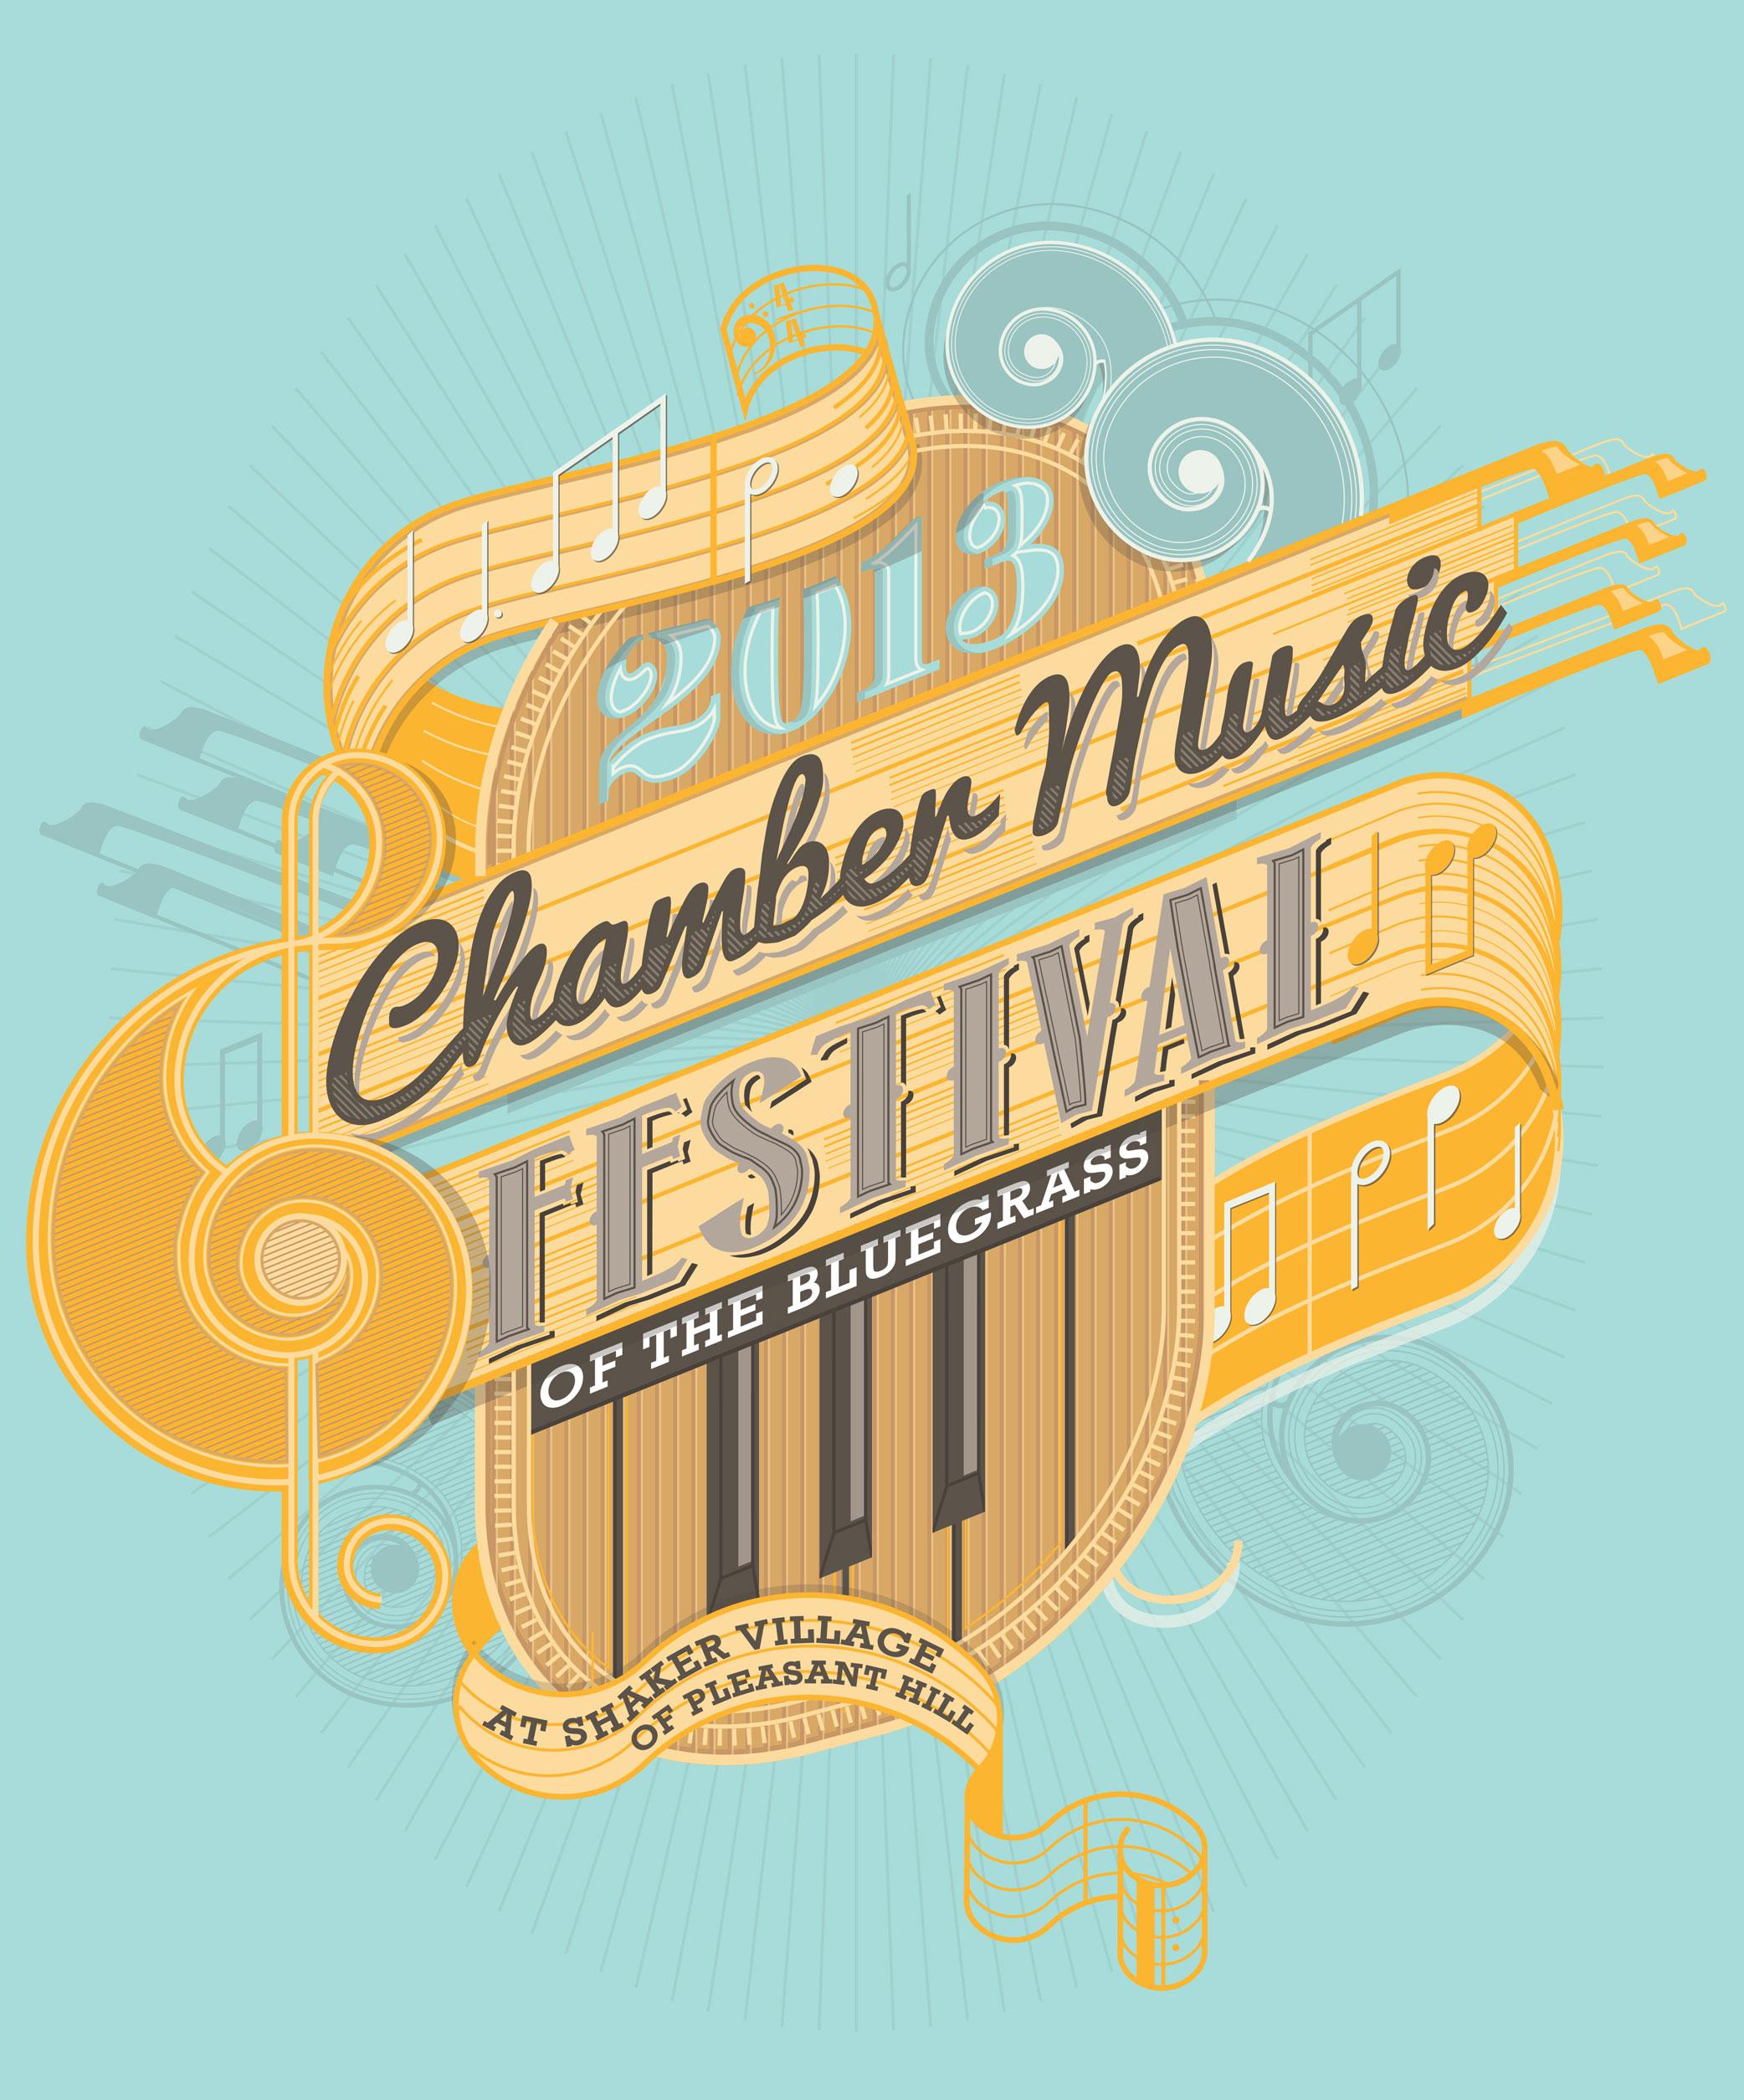 ChamberMusicFestivalPoster